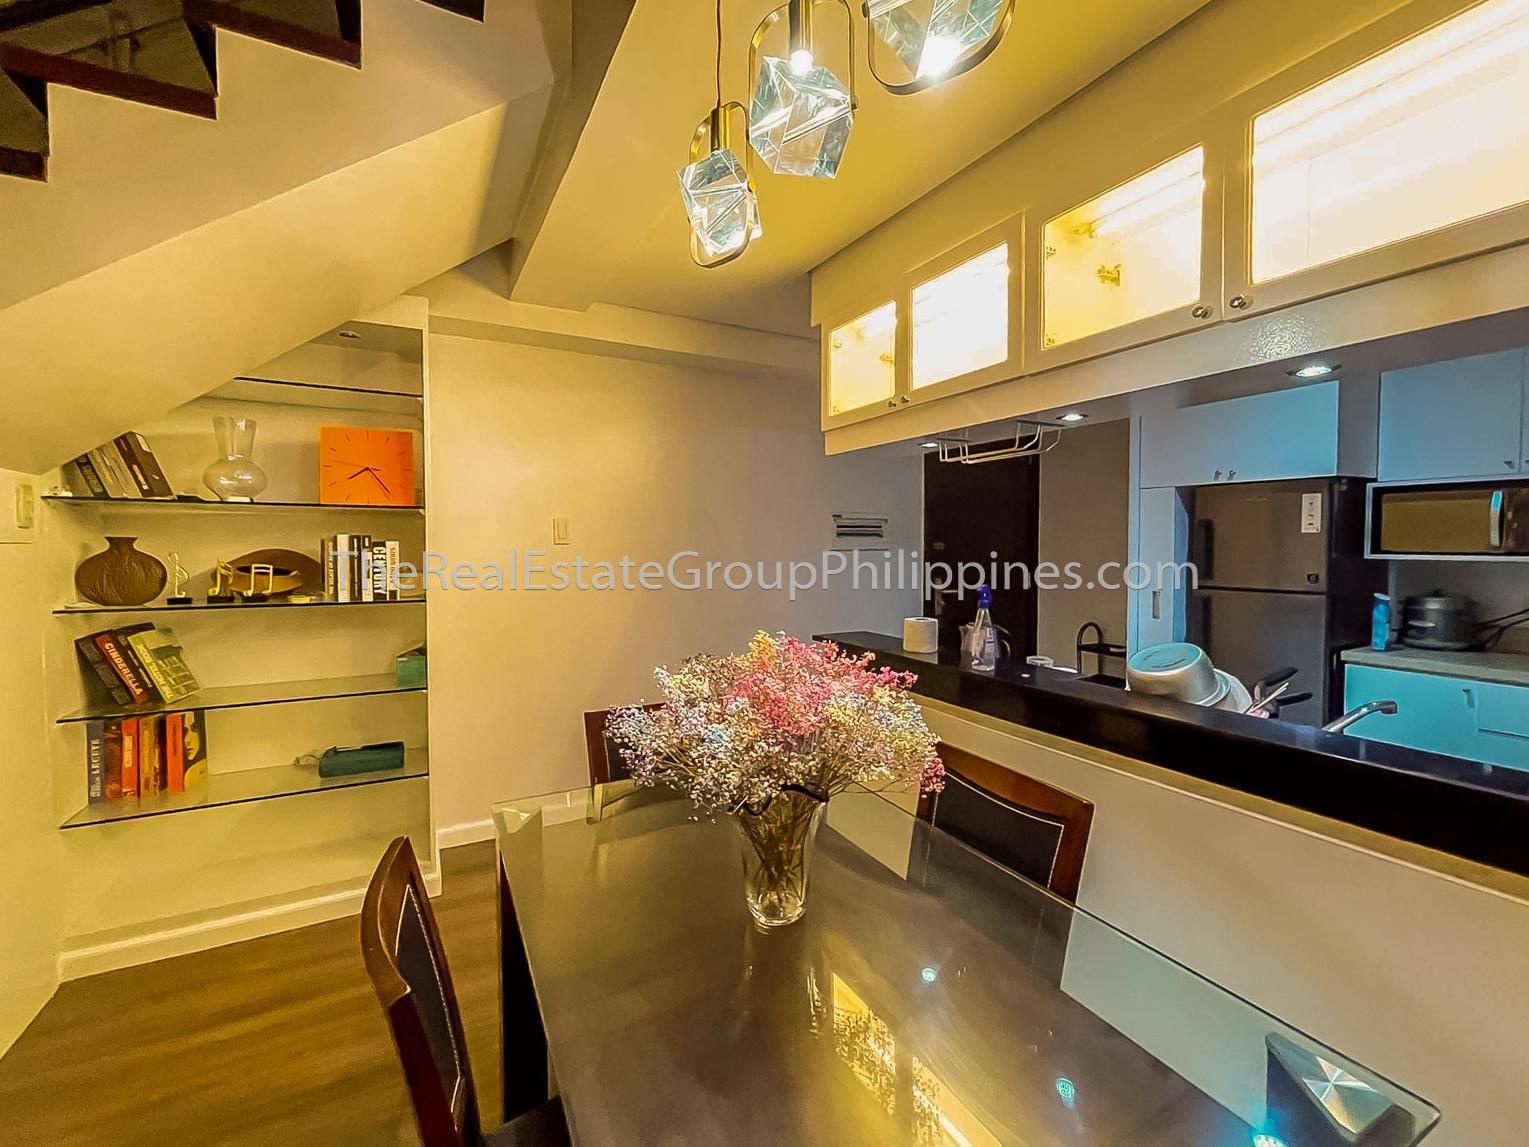 3 Bedroom Condominium For Sale BGC, Three Bedroom Condo For Sale Fort Residences, 3 BR Condo For Sale BGC Taguig, 3BR Condo For Sale Burgos Circle BGC8